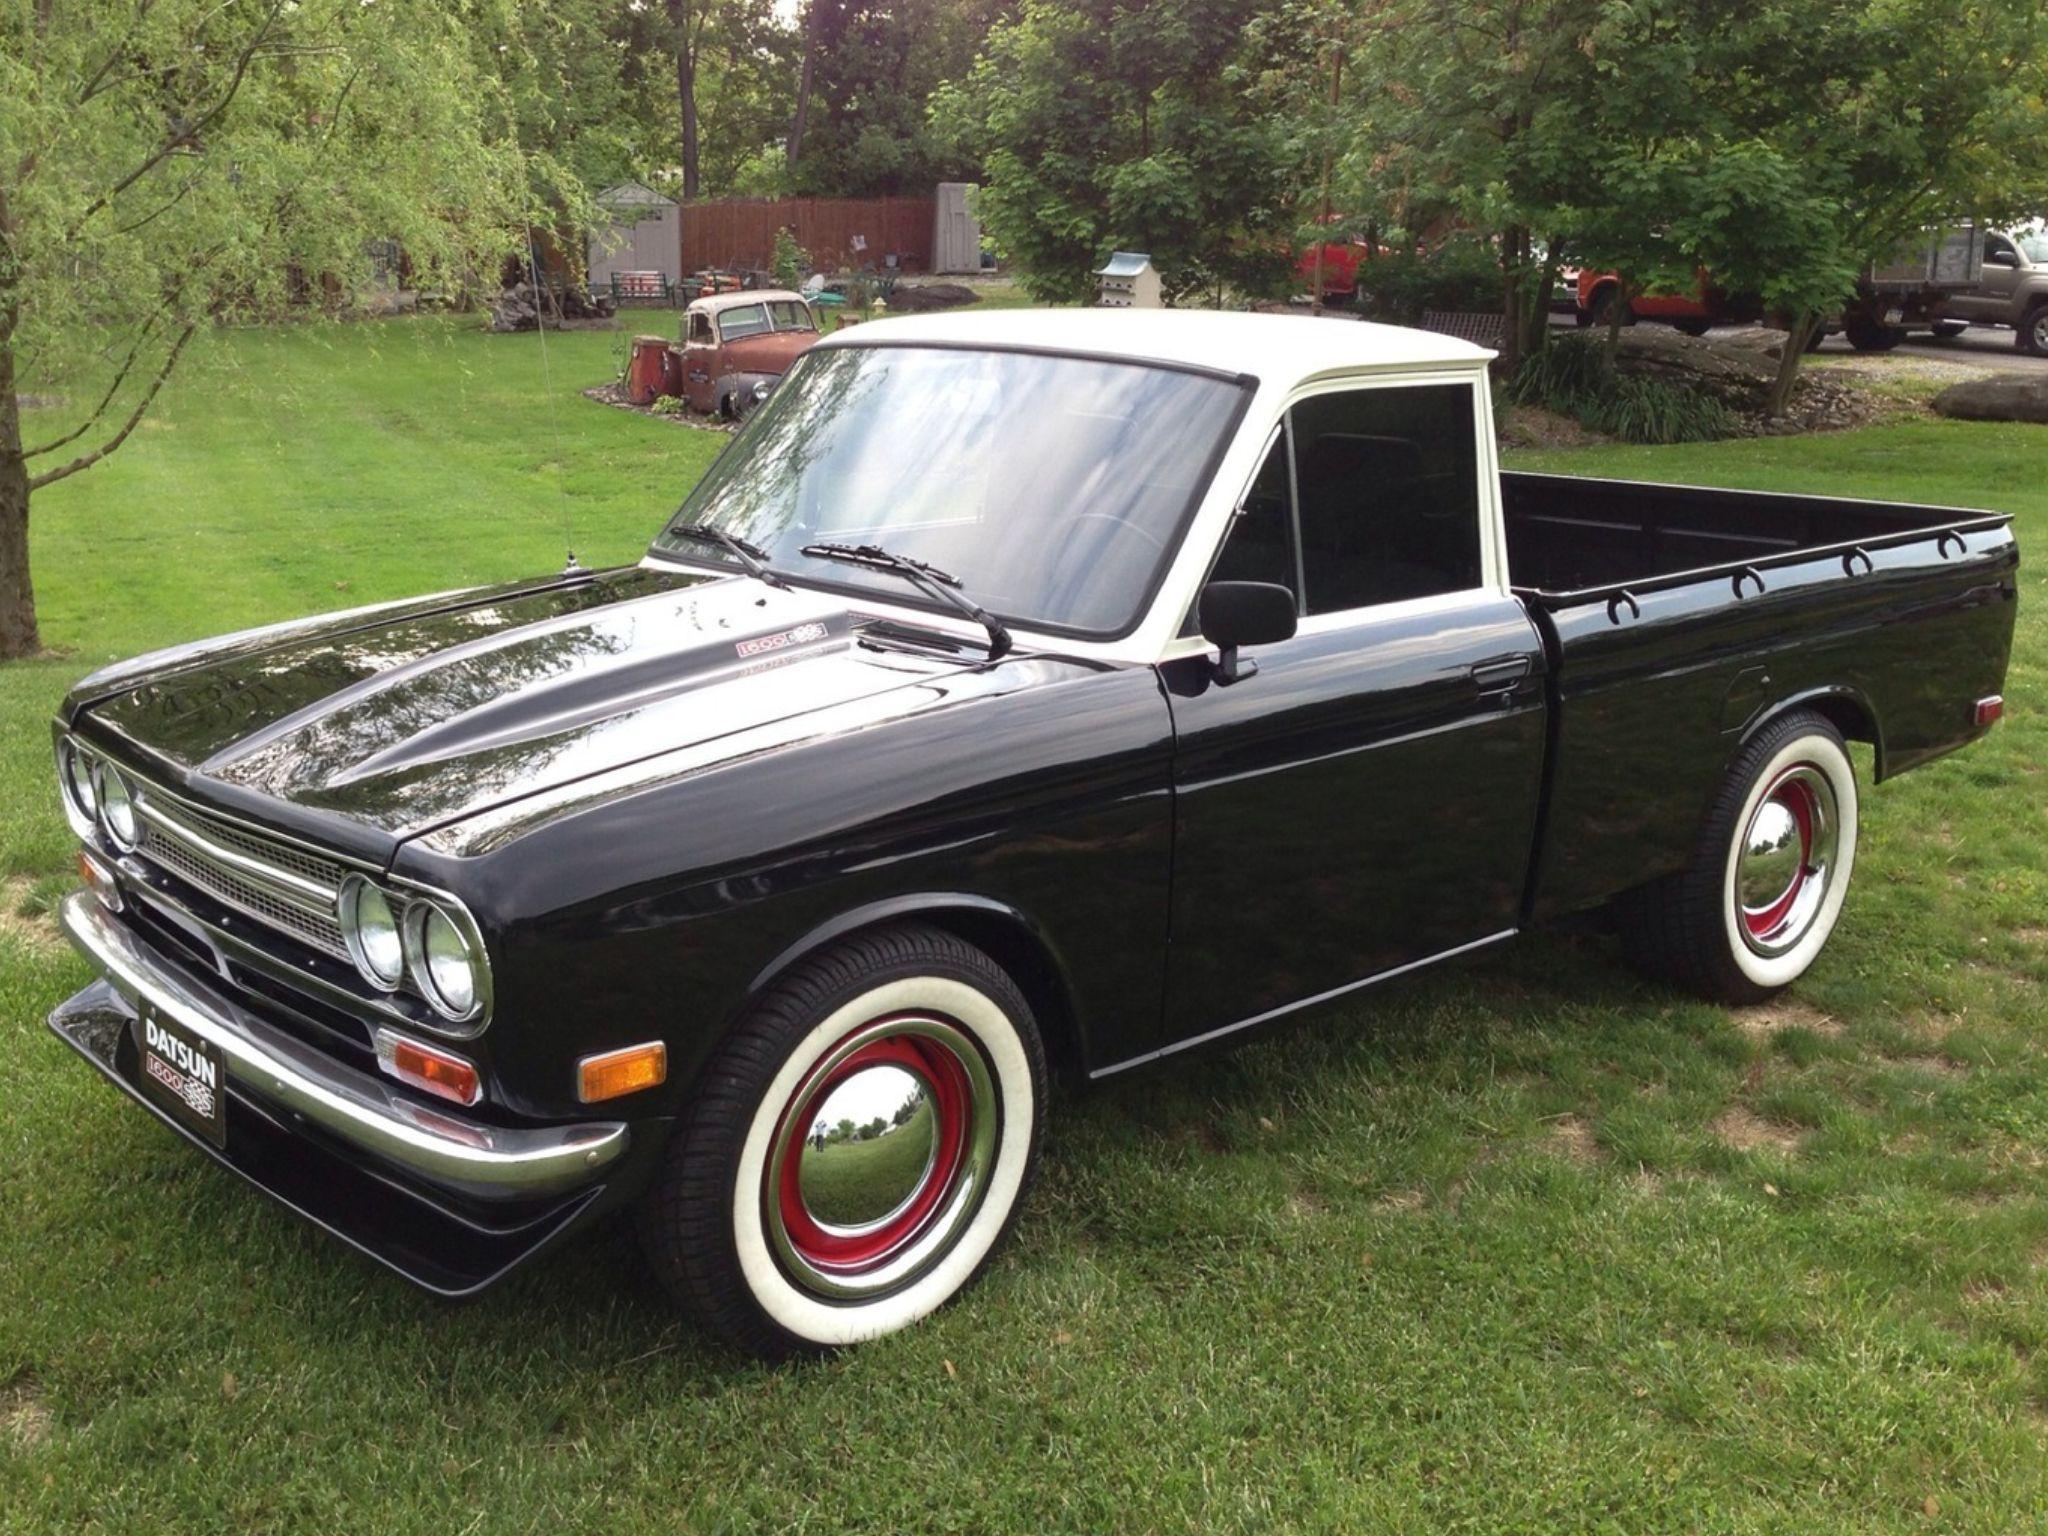 Datsun pickup Ratrod   Cars and bikes   Nissan trucks ...